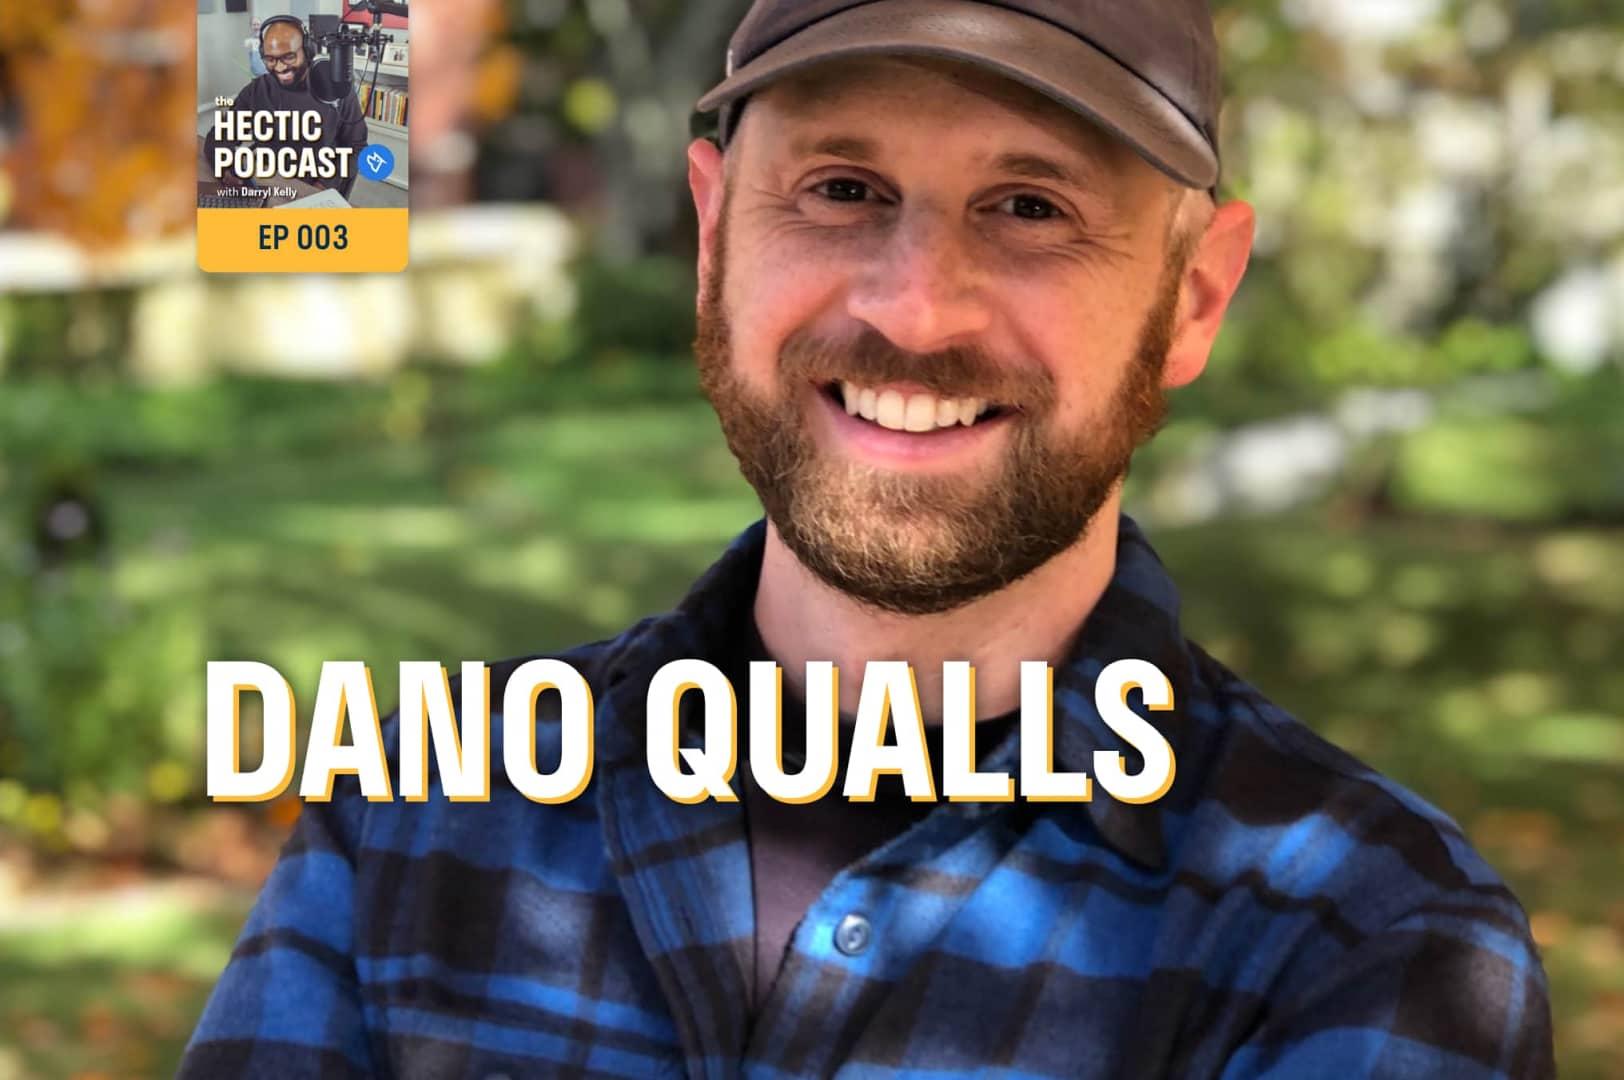 Dano Qualls